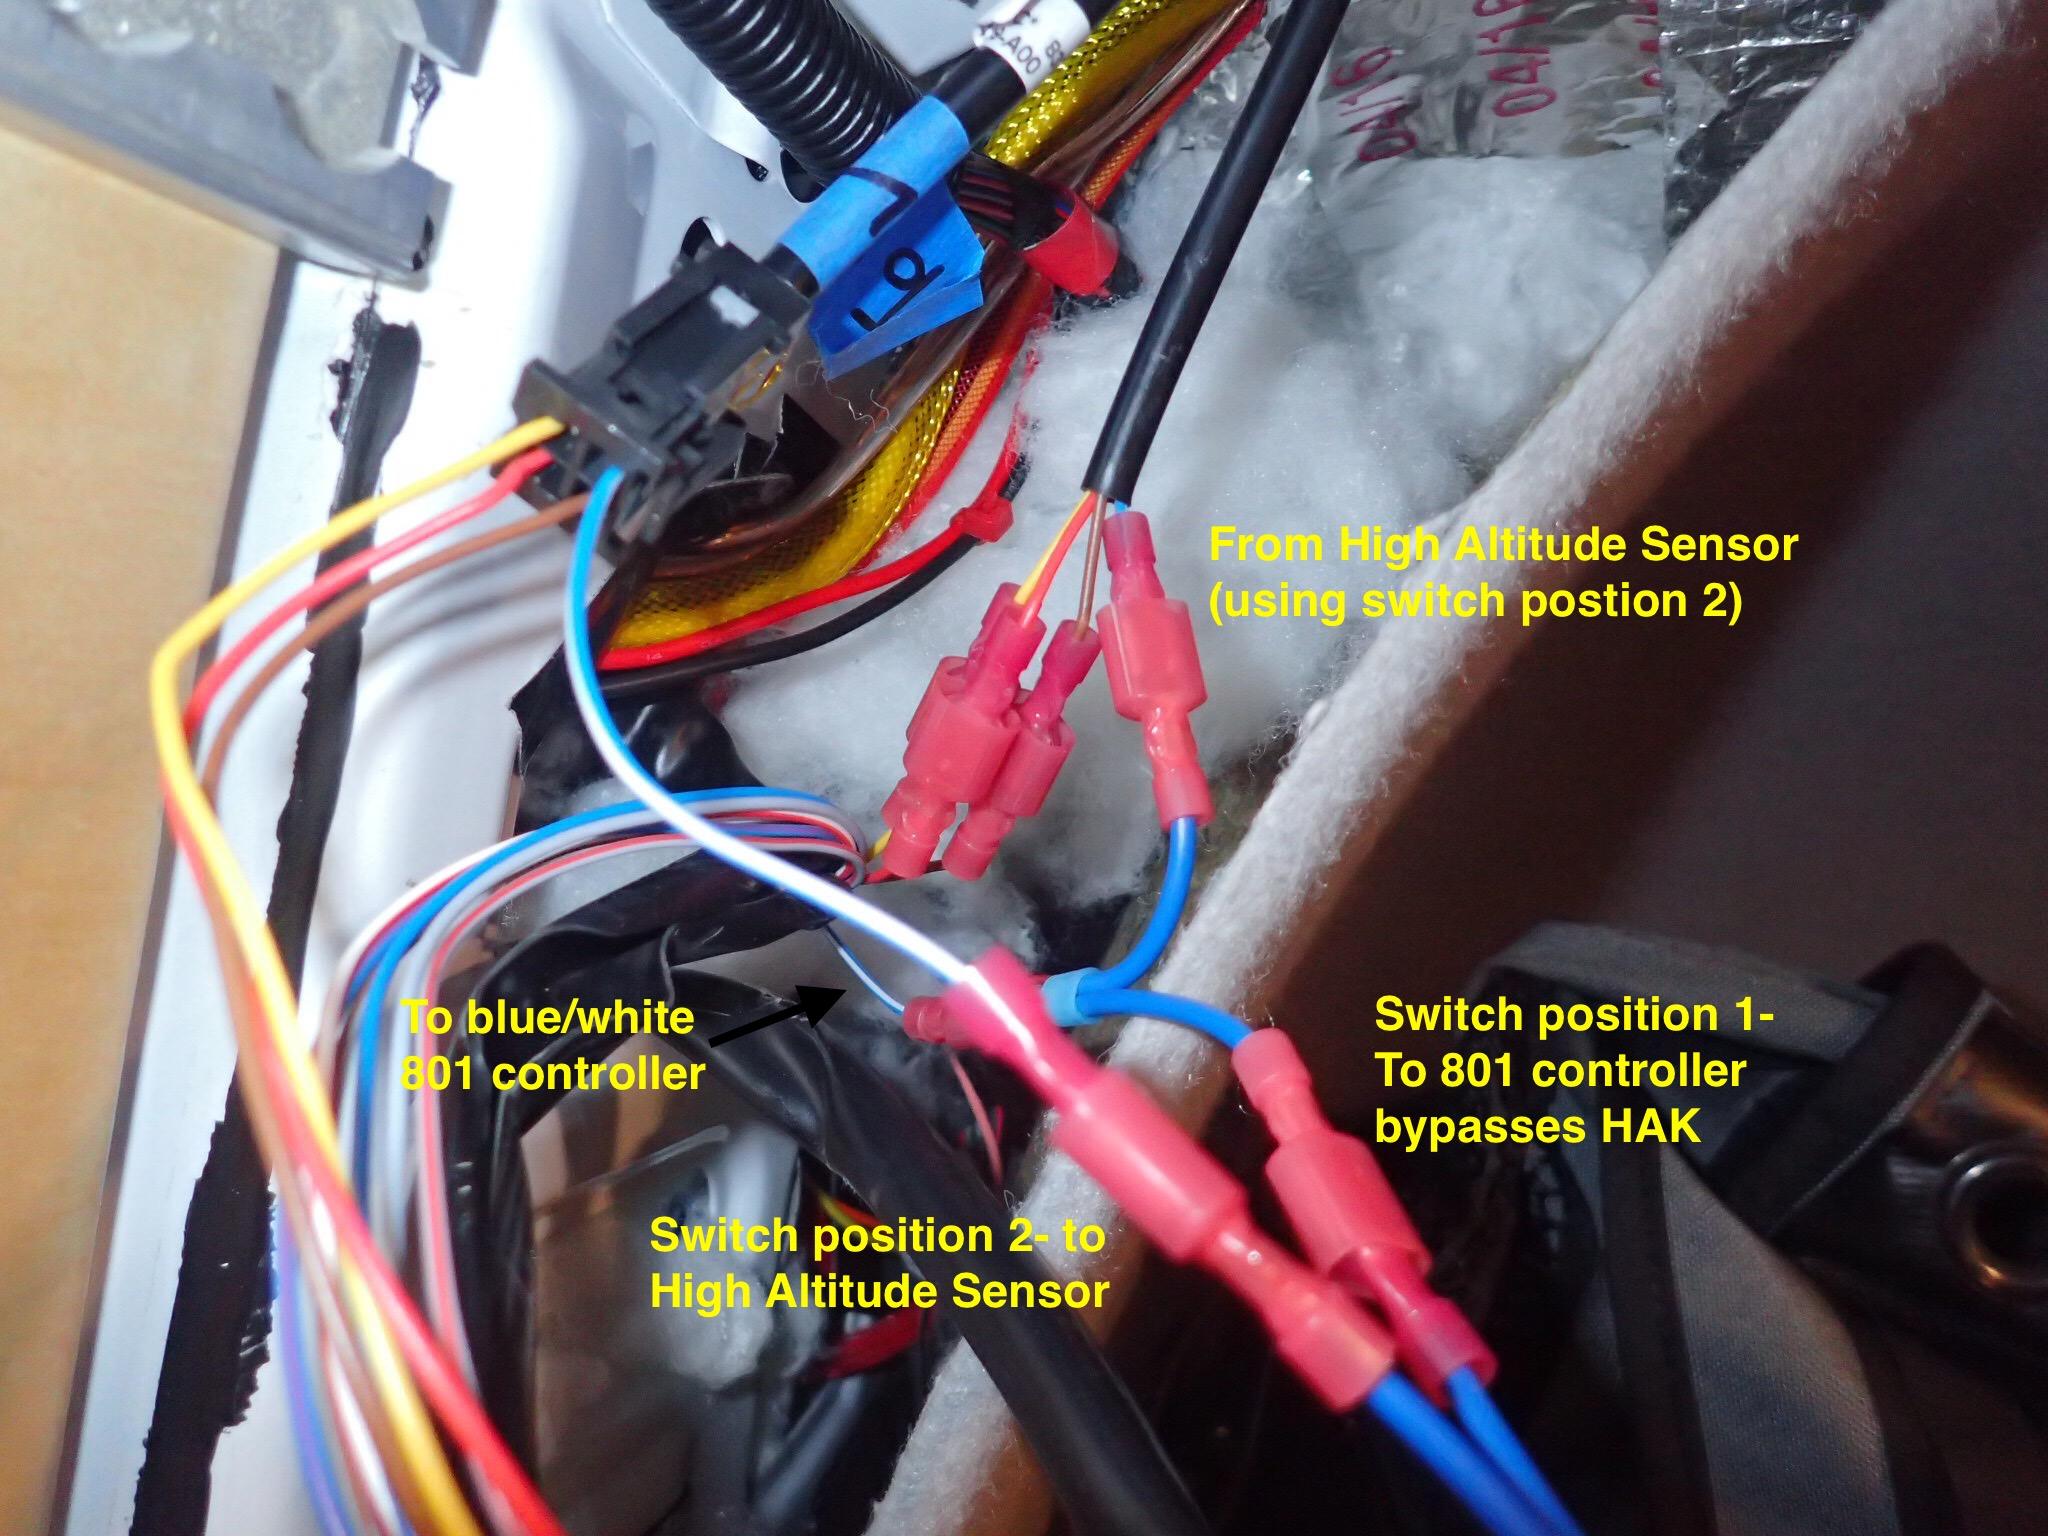 fullsizeoutput_1c41?w\=610\&h\=458 diagram d2 wiring digi airtronics wiring diagrams Basic Electrical Wiring Diagrams at creativeand.co